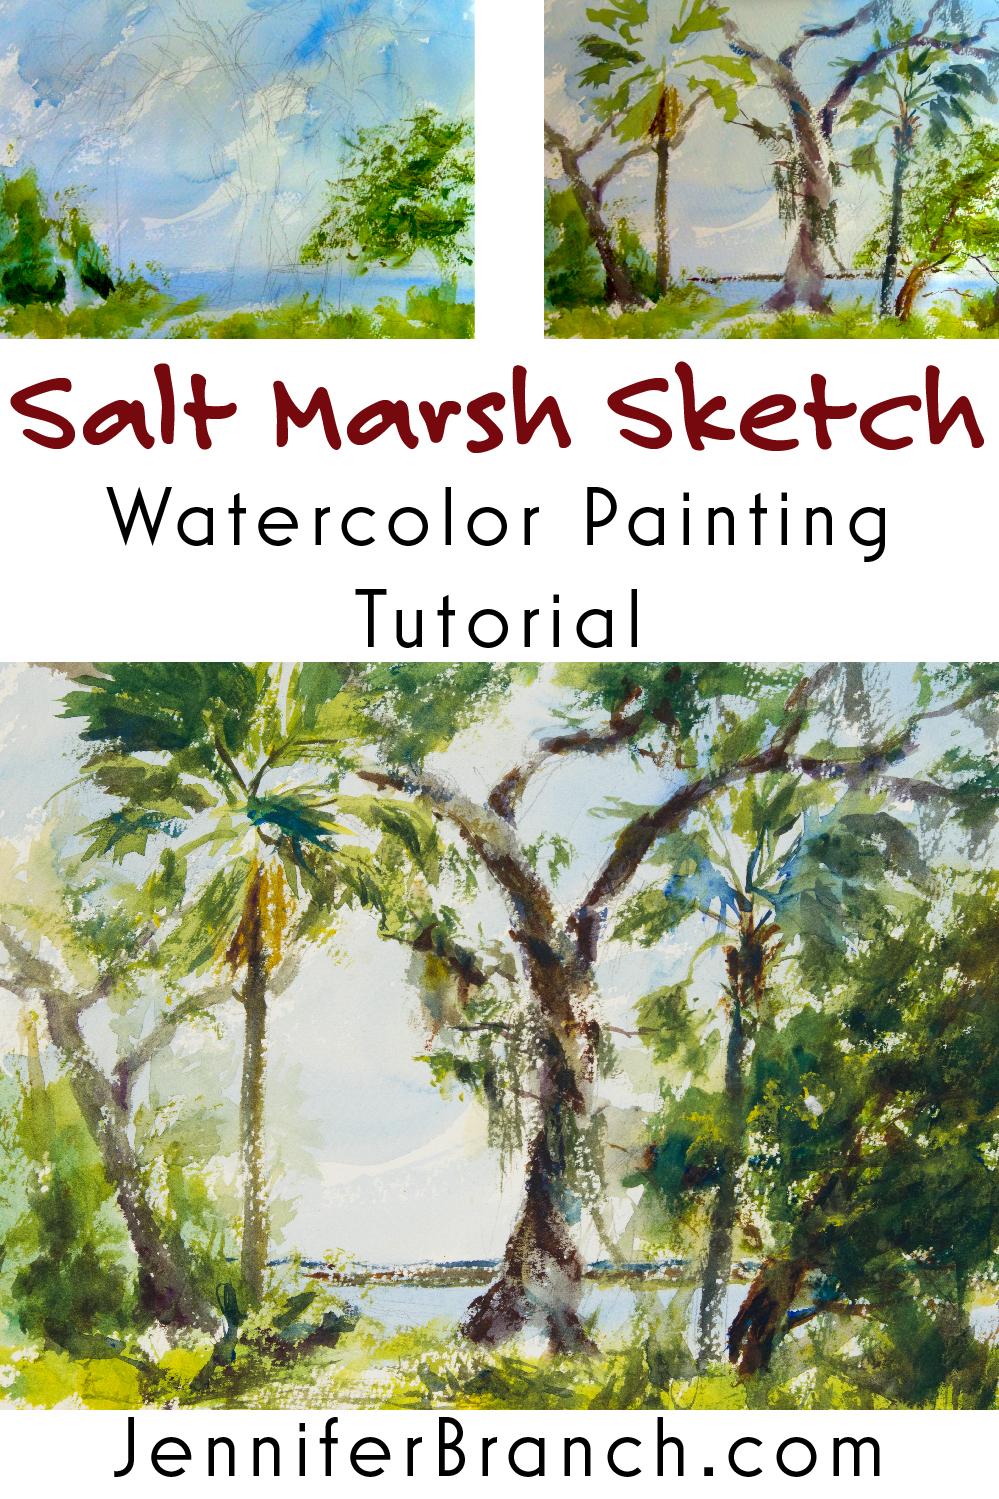 Salt Marsh Sketch Tutorial watercolor painting tutorial by Jennifer Branch